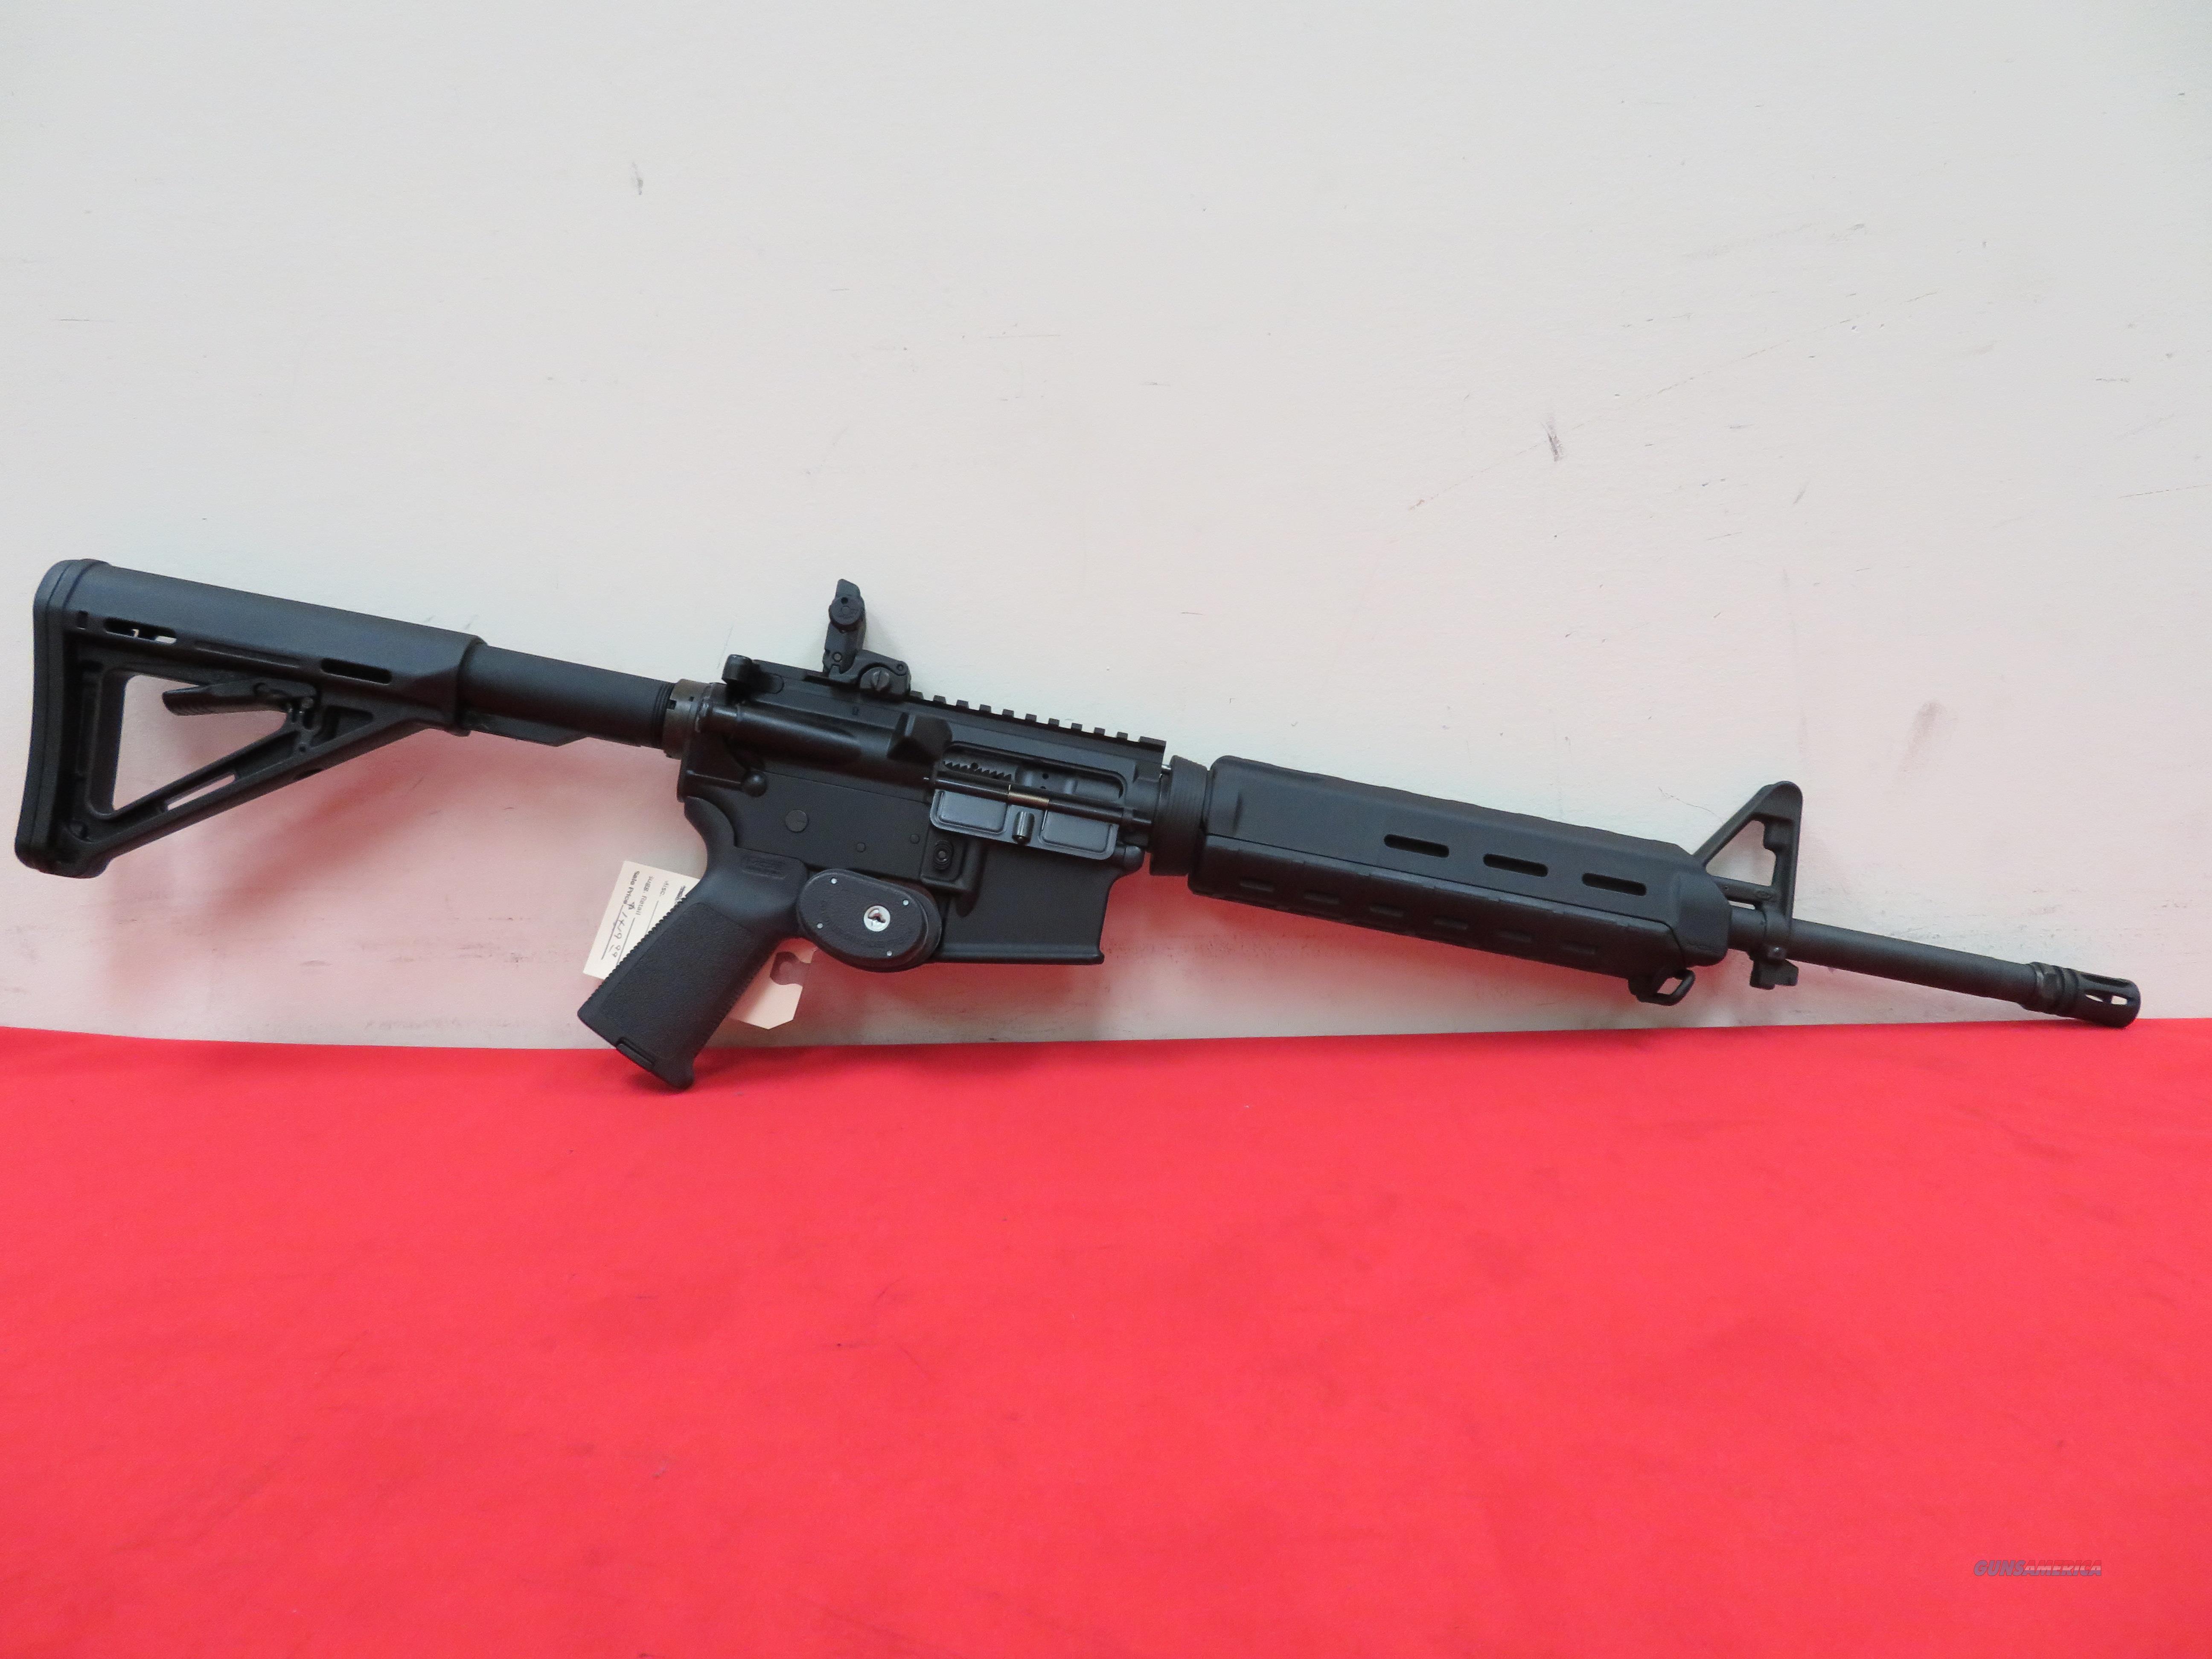 "CMMG MK4 MOE EDITION 16"" 223 REM/ 5.56 NATO  Guns > Rifles > CMMG > CMMG Rifle"